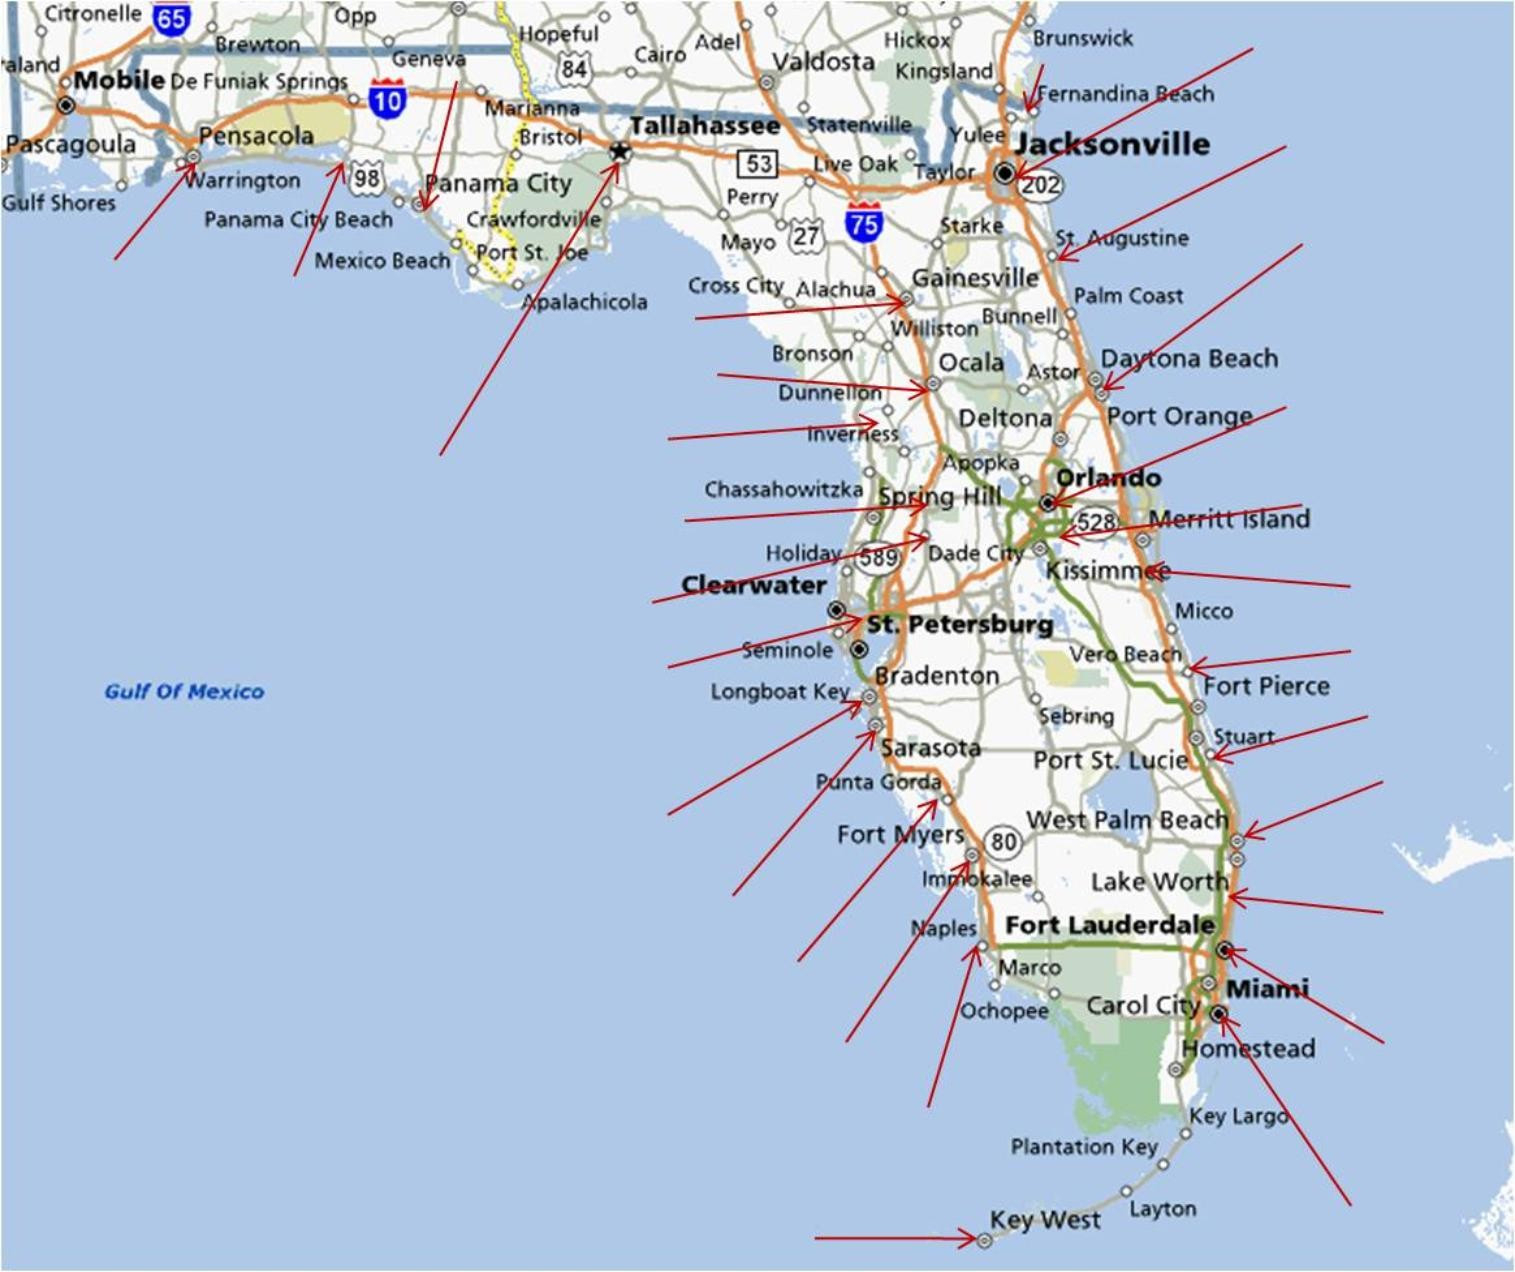 Florida Gulf Coast Beaches Map | M88M88 - Florida Gulf Coastline Map